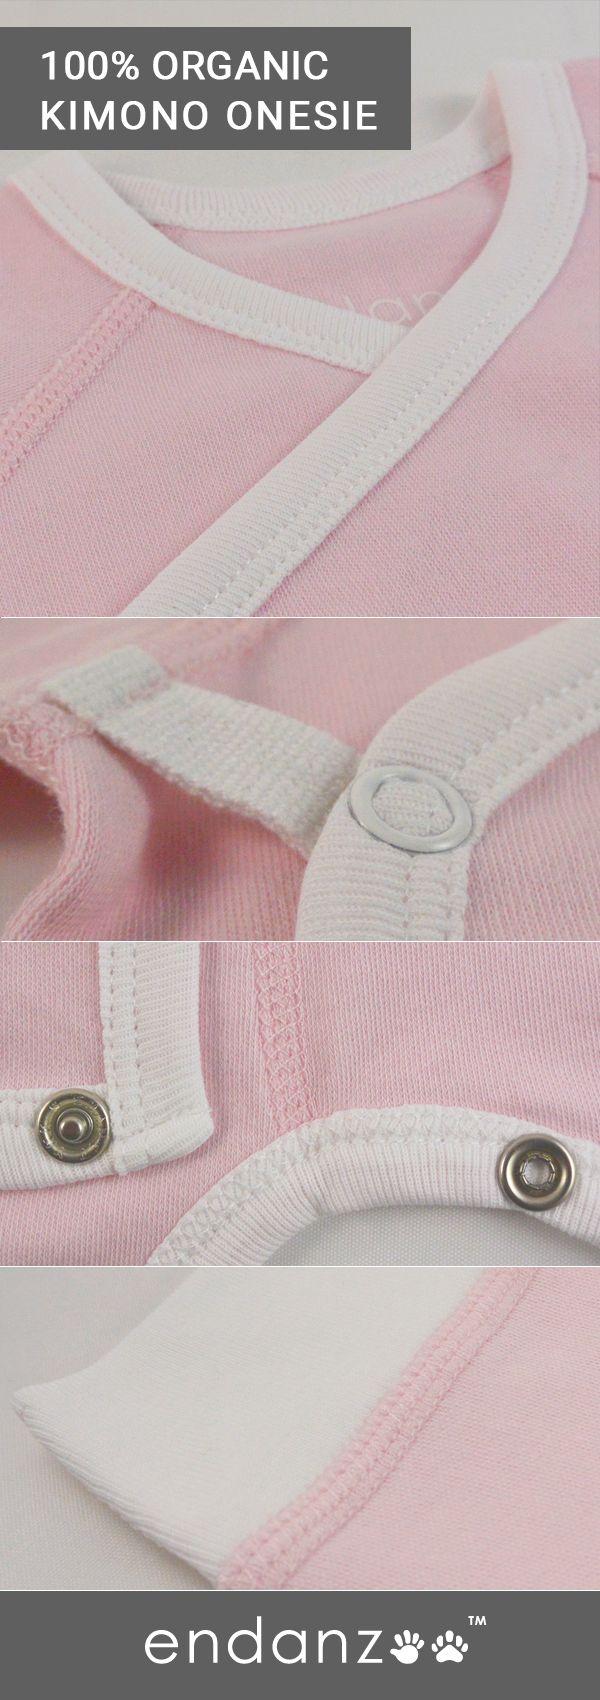 Endanzoo Organic Kimono Onesie - Pink. 100% Organic Cotton.